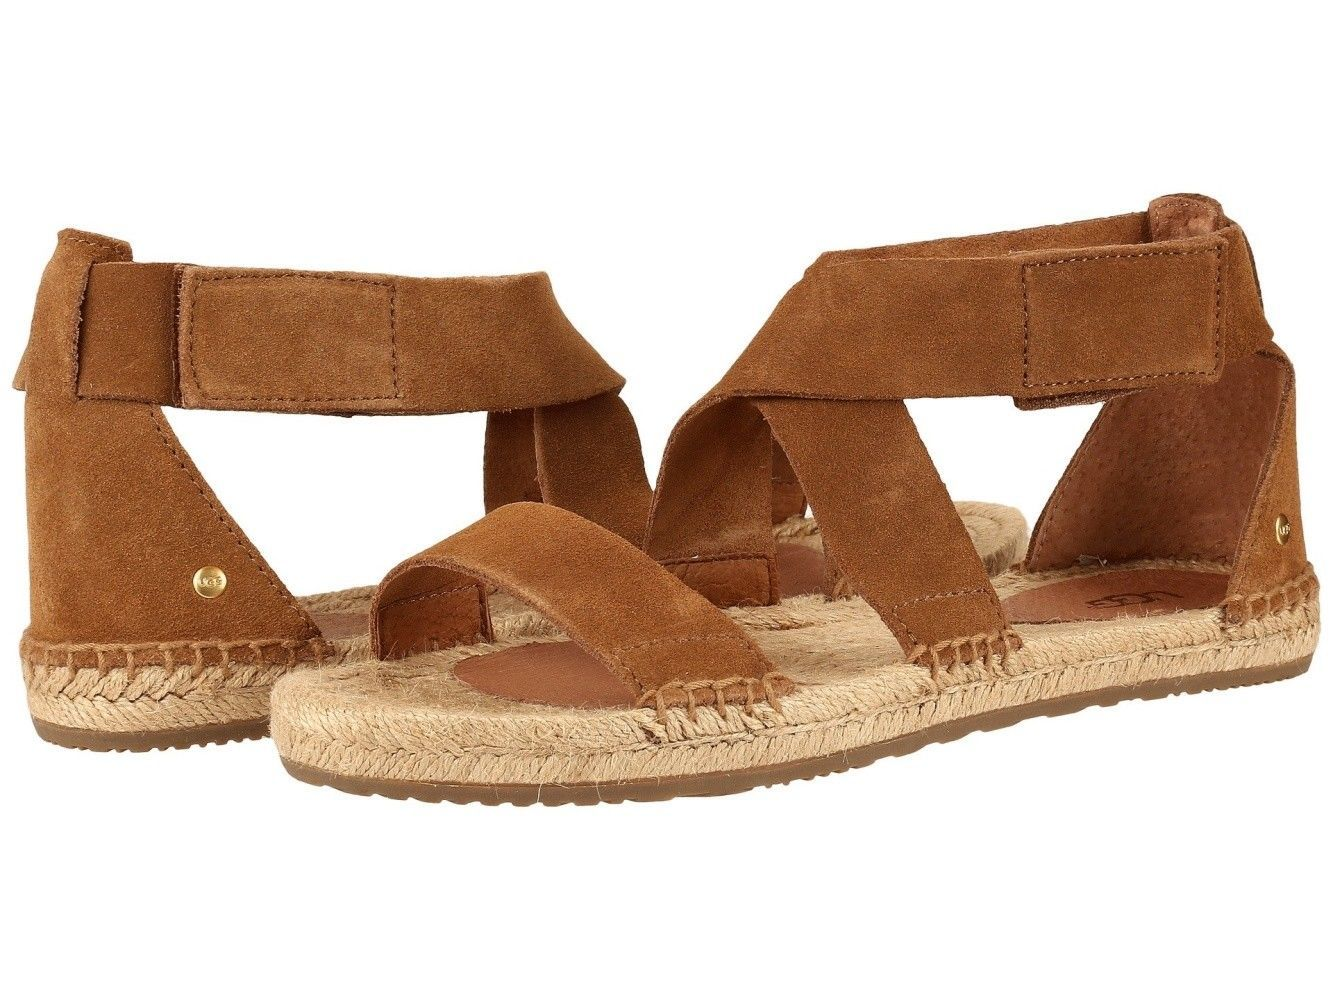 ef42da9e0 UGG Womens Mila Sandals Tan Natural and 50 similar items. 57